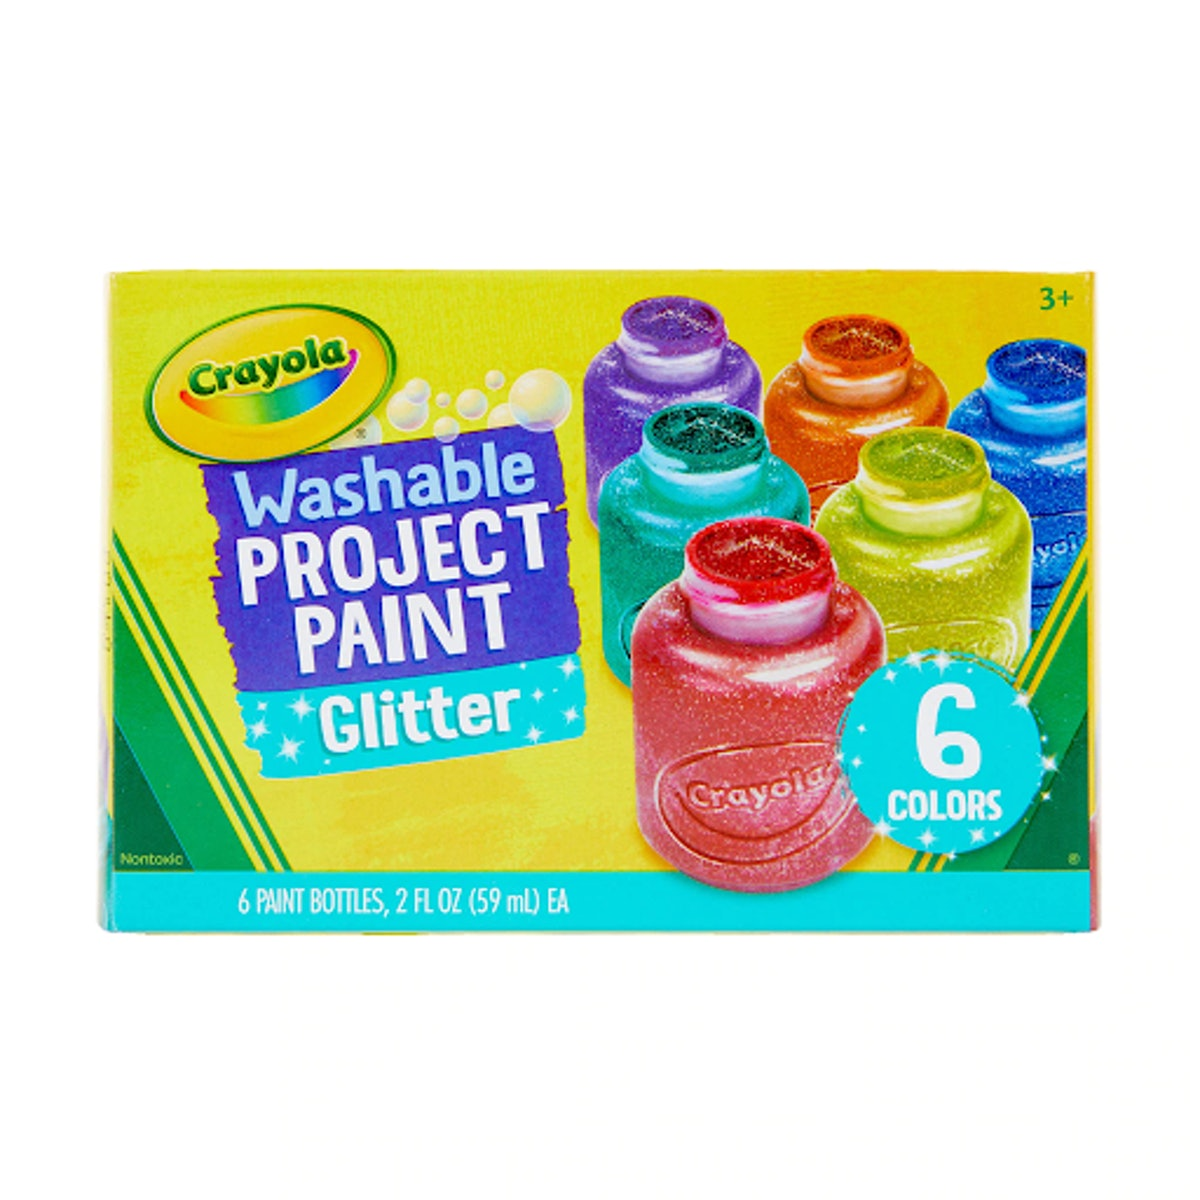 Crayola Glitter Washable Kids' Paint